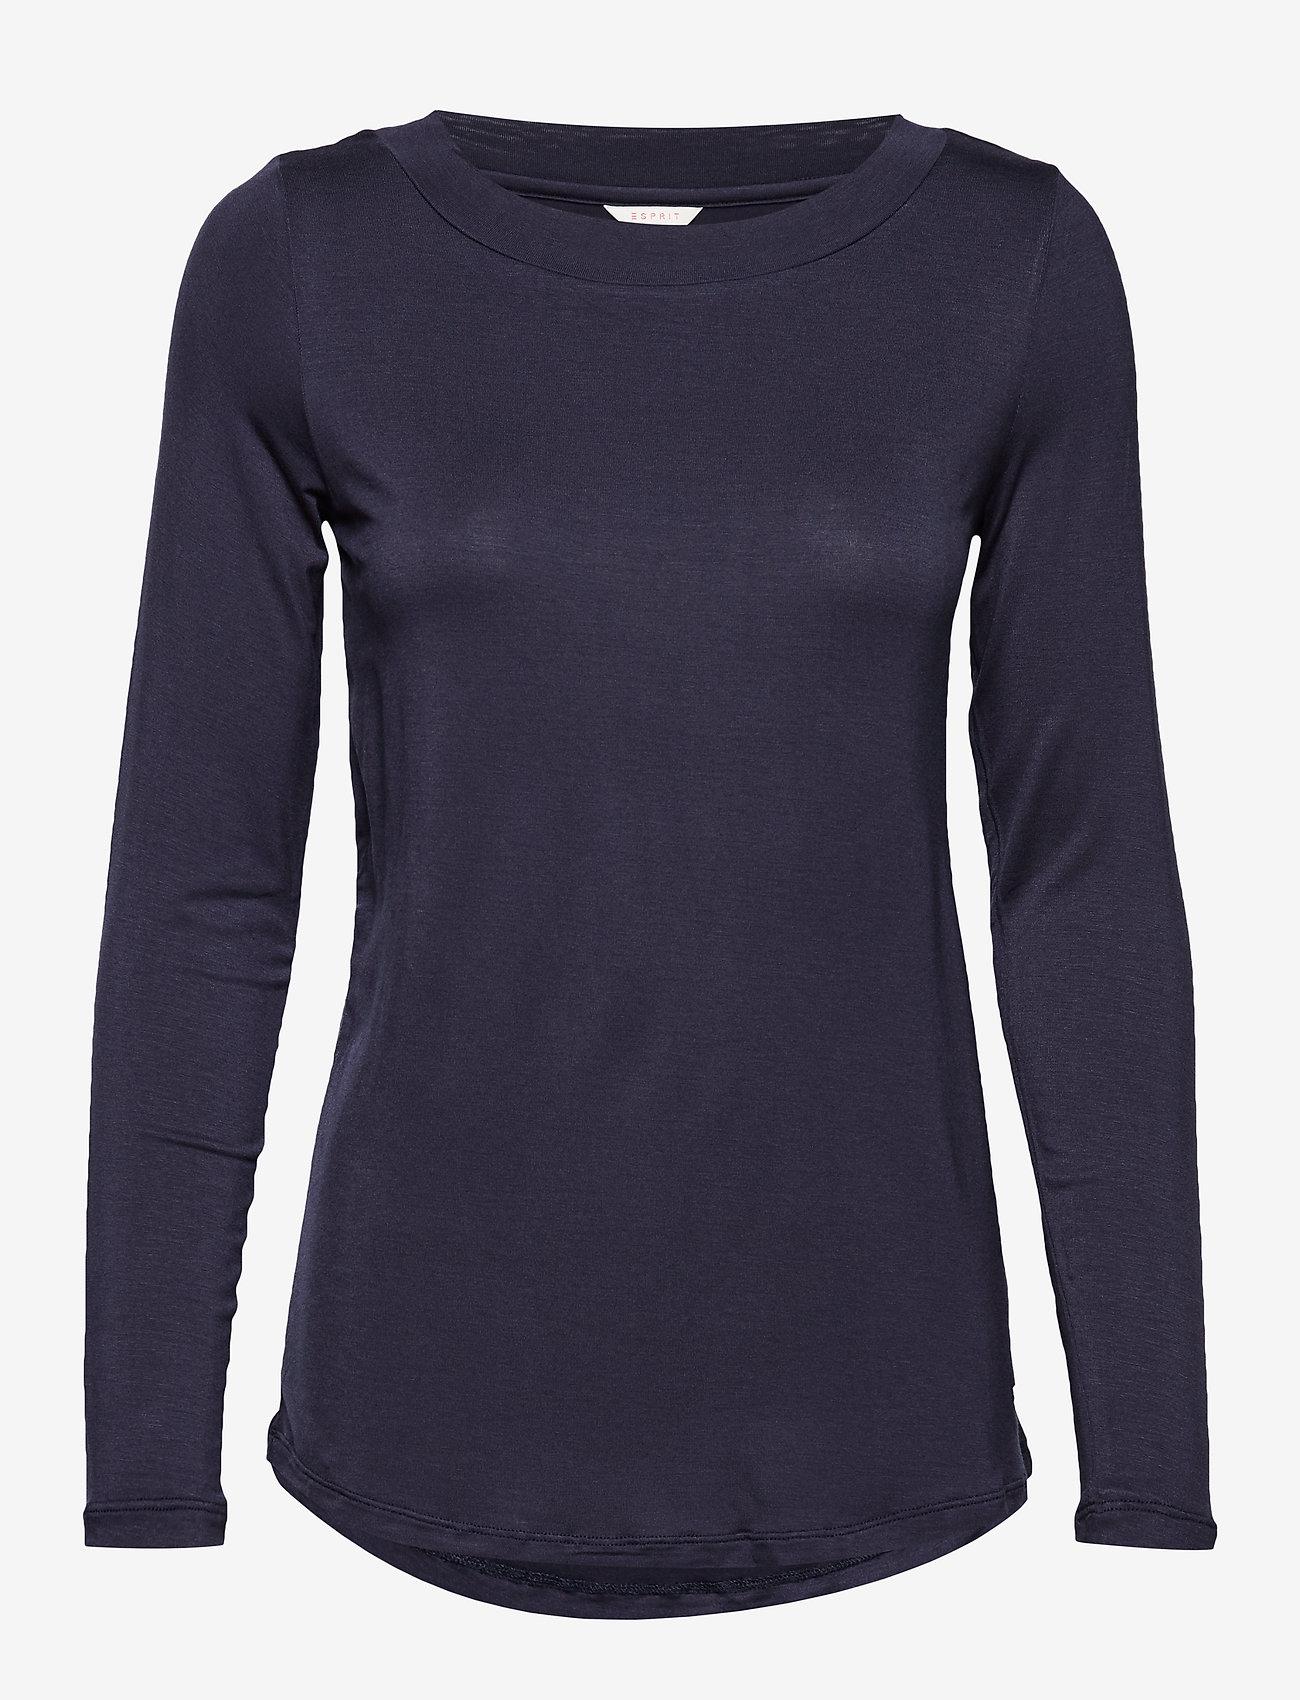 Esprit Bodywear Women - Night-T-Shirts - tops - navy - 0